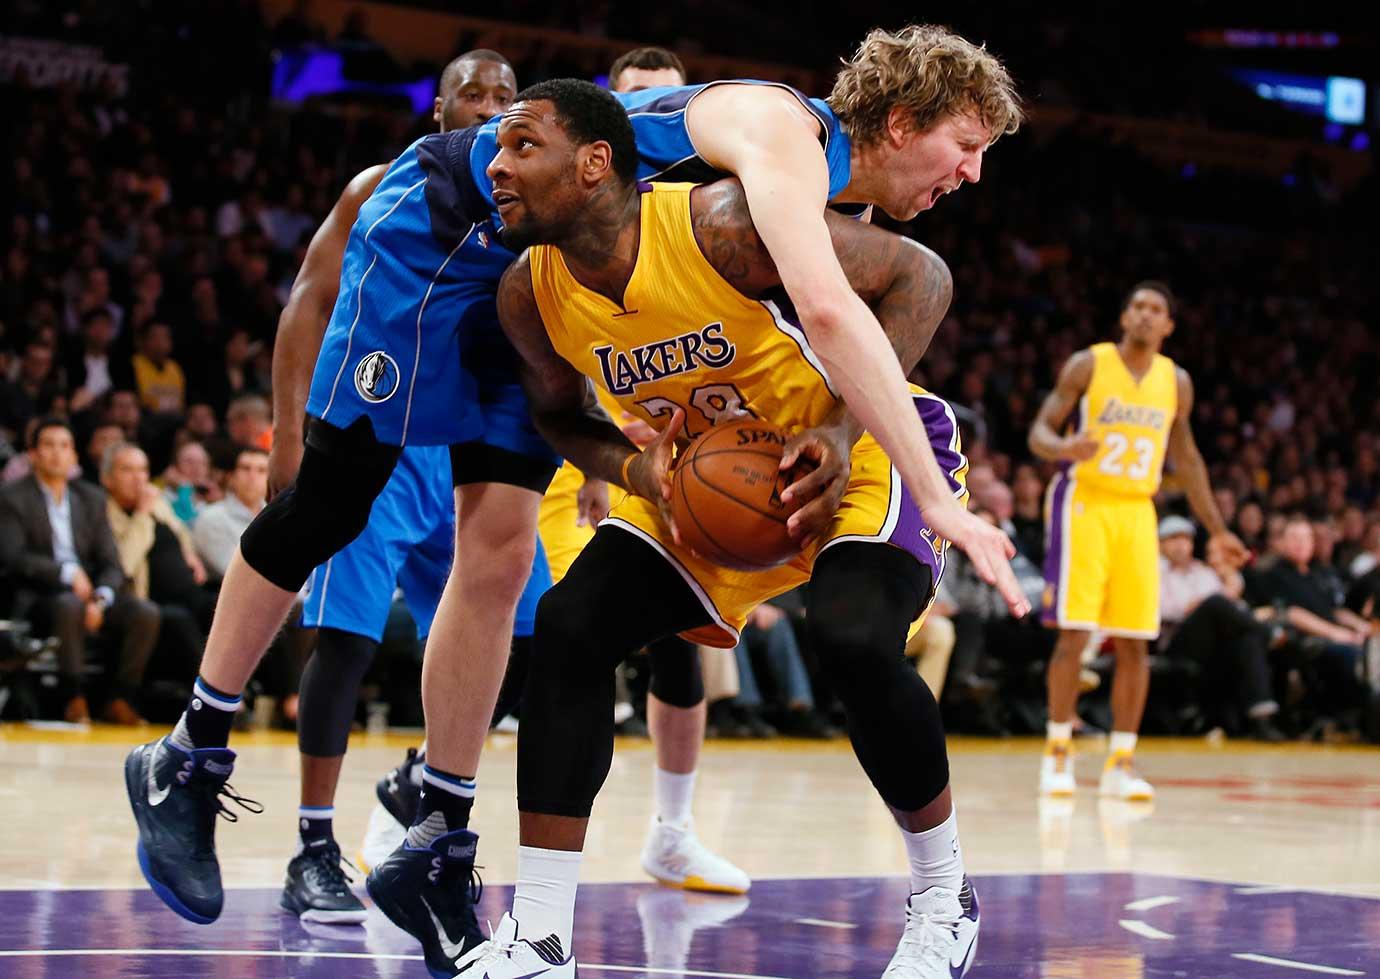 Dirk Nowitzki of Dallas fouls Tarik Black of the Lakers during a game in Los Angeles. The Mavericks won 92-90.